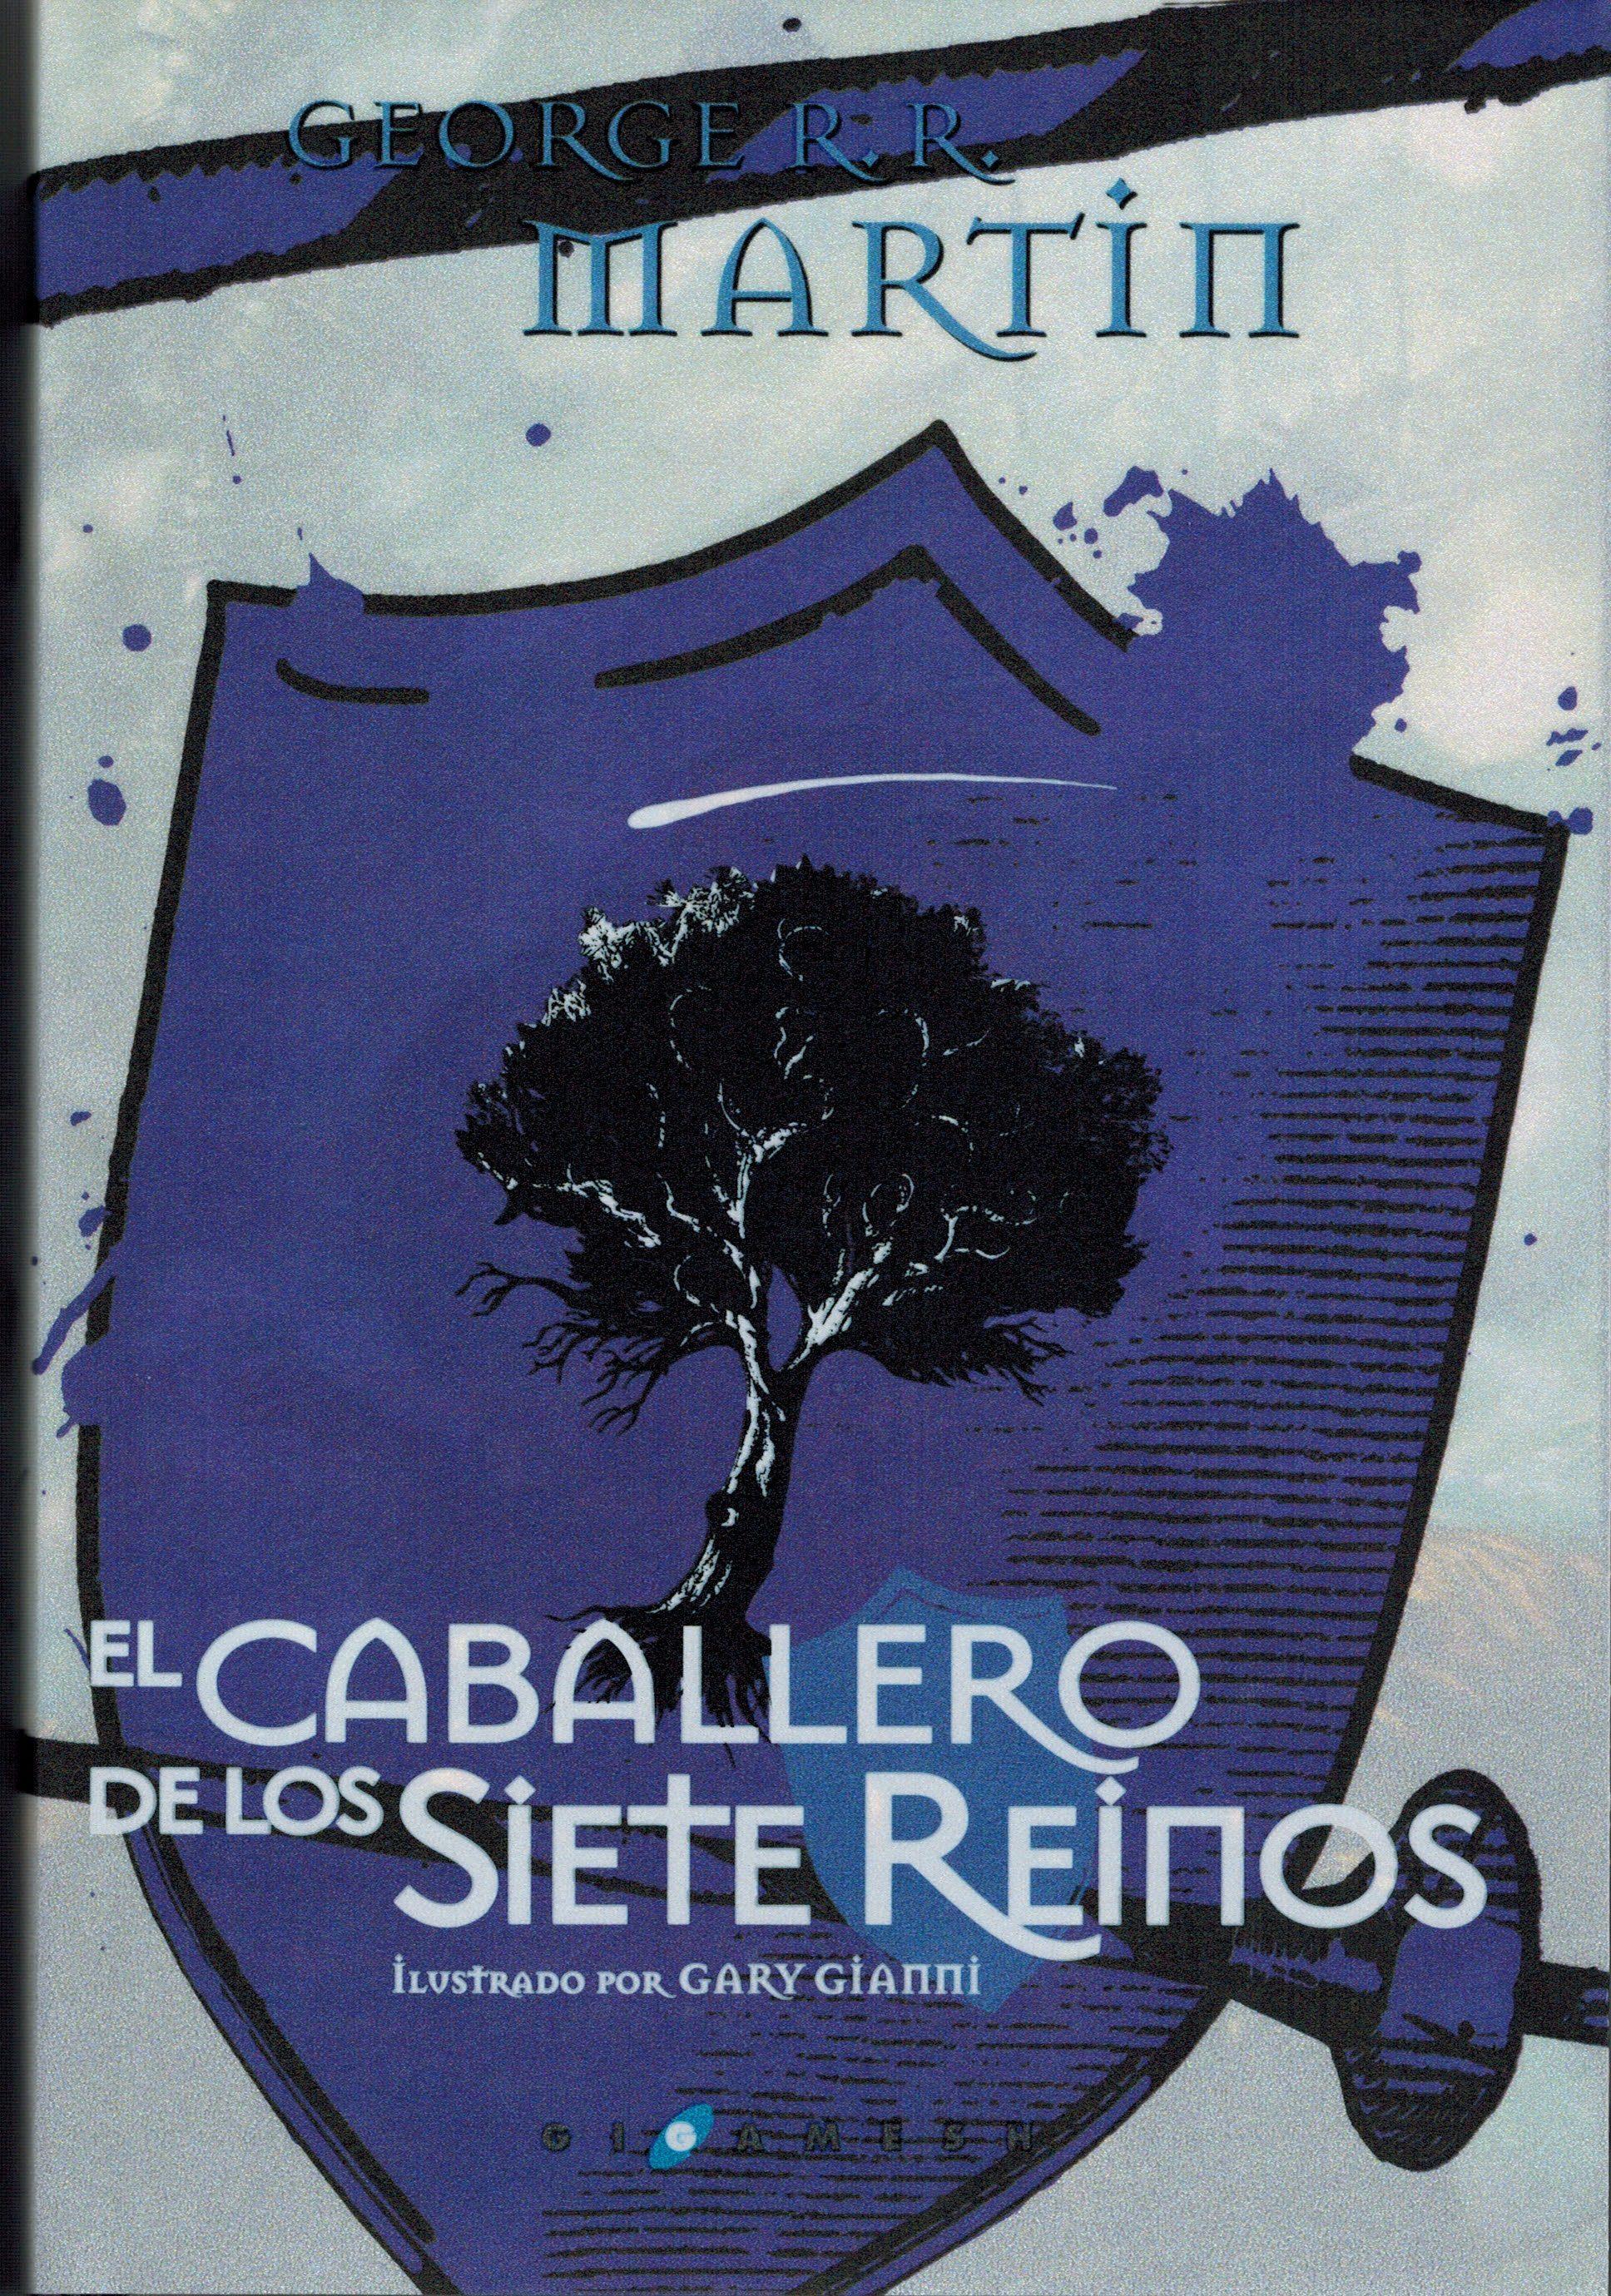 EL-CABALLERO-DE-LOS-SIETE-REINOS-Urrike.jpg